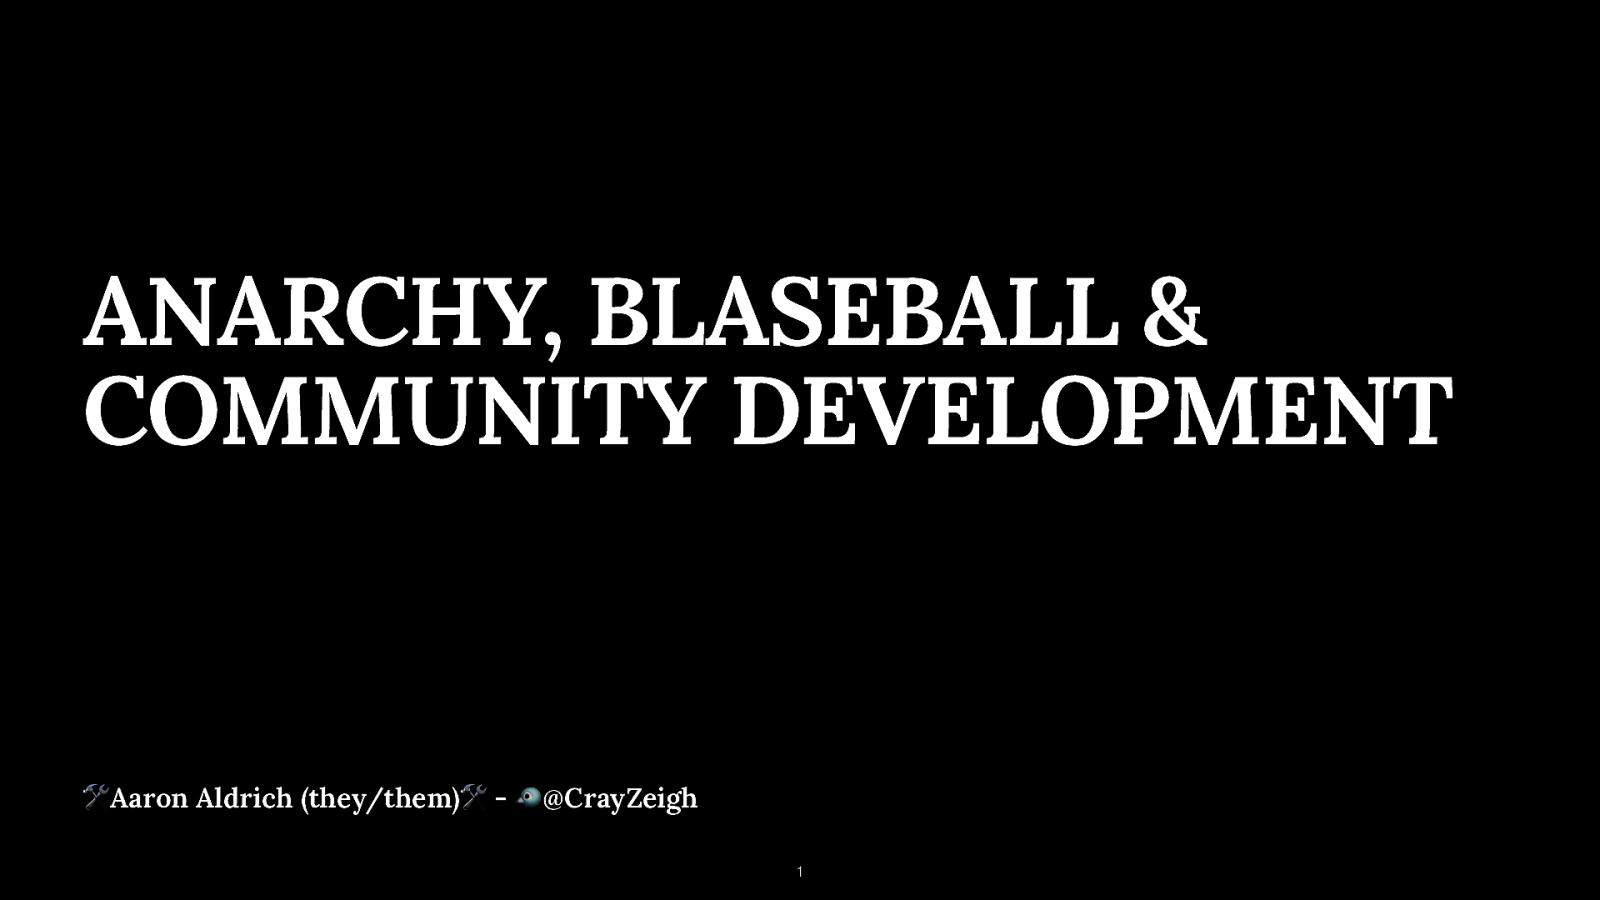 Anarchy, Blaseball & Community Development